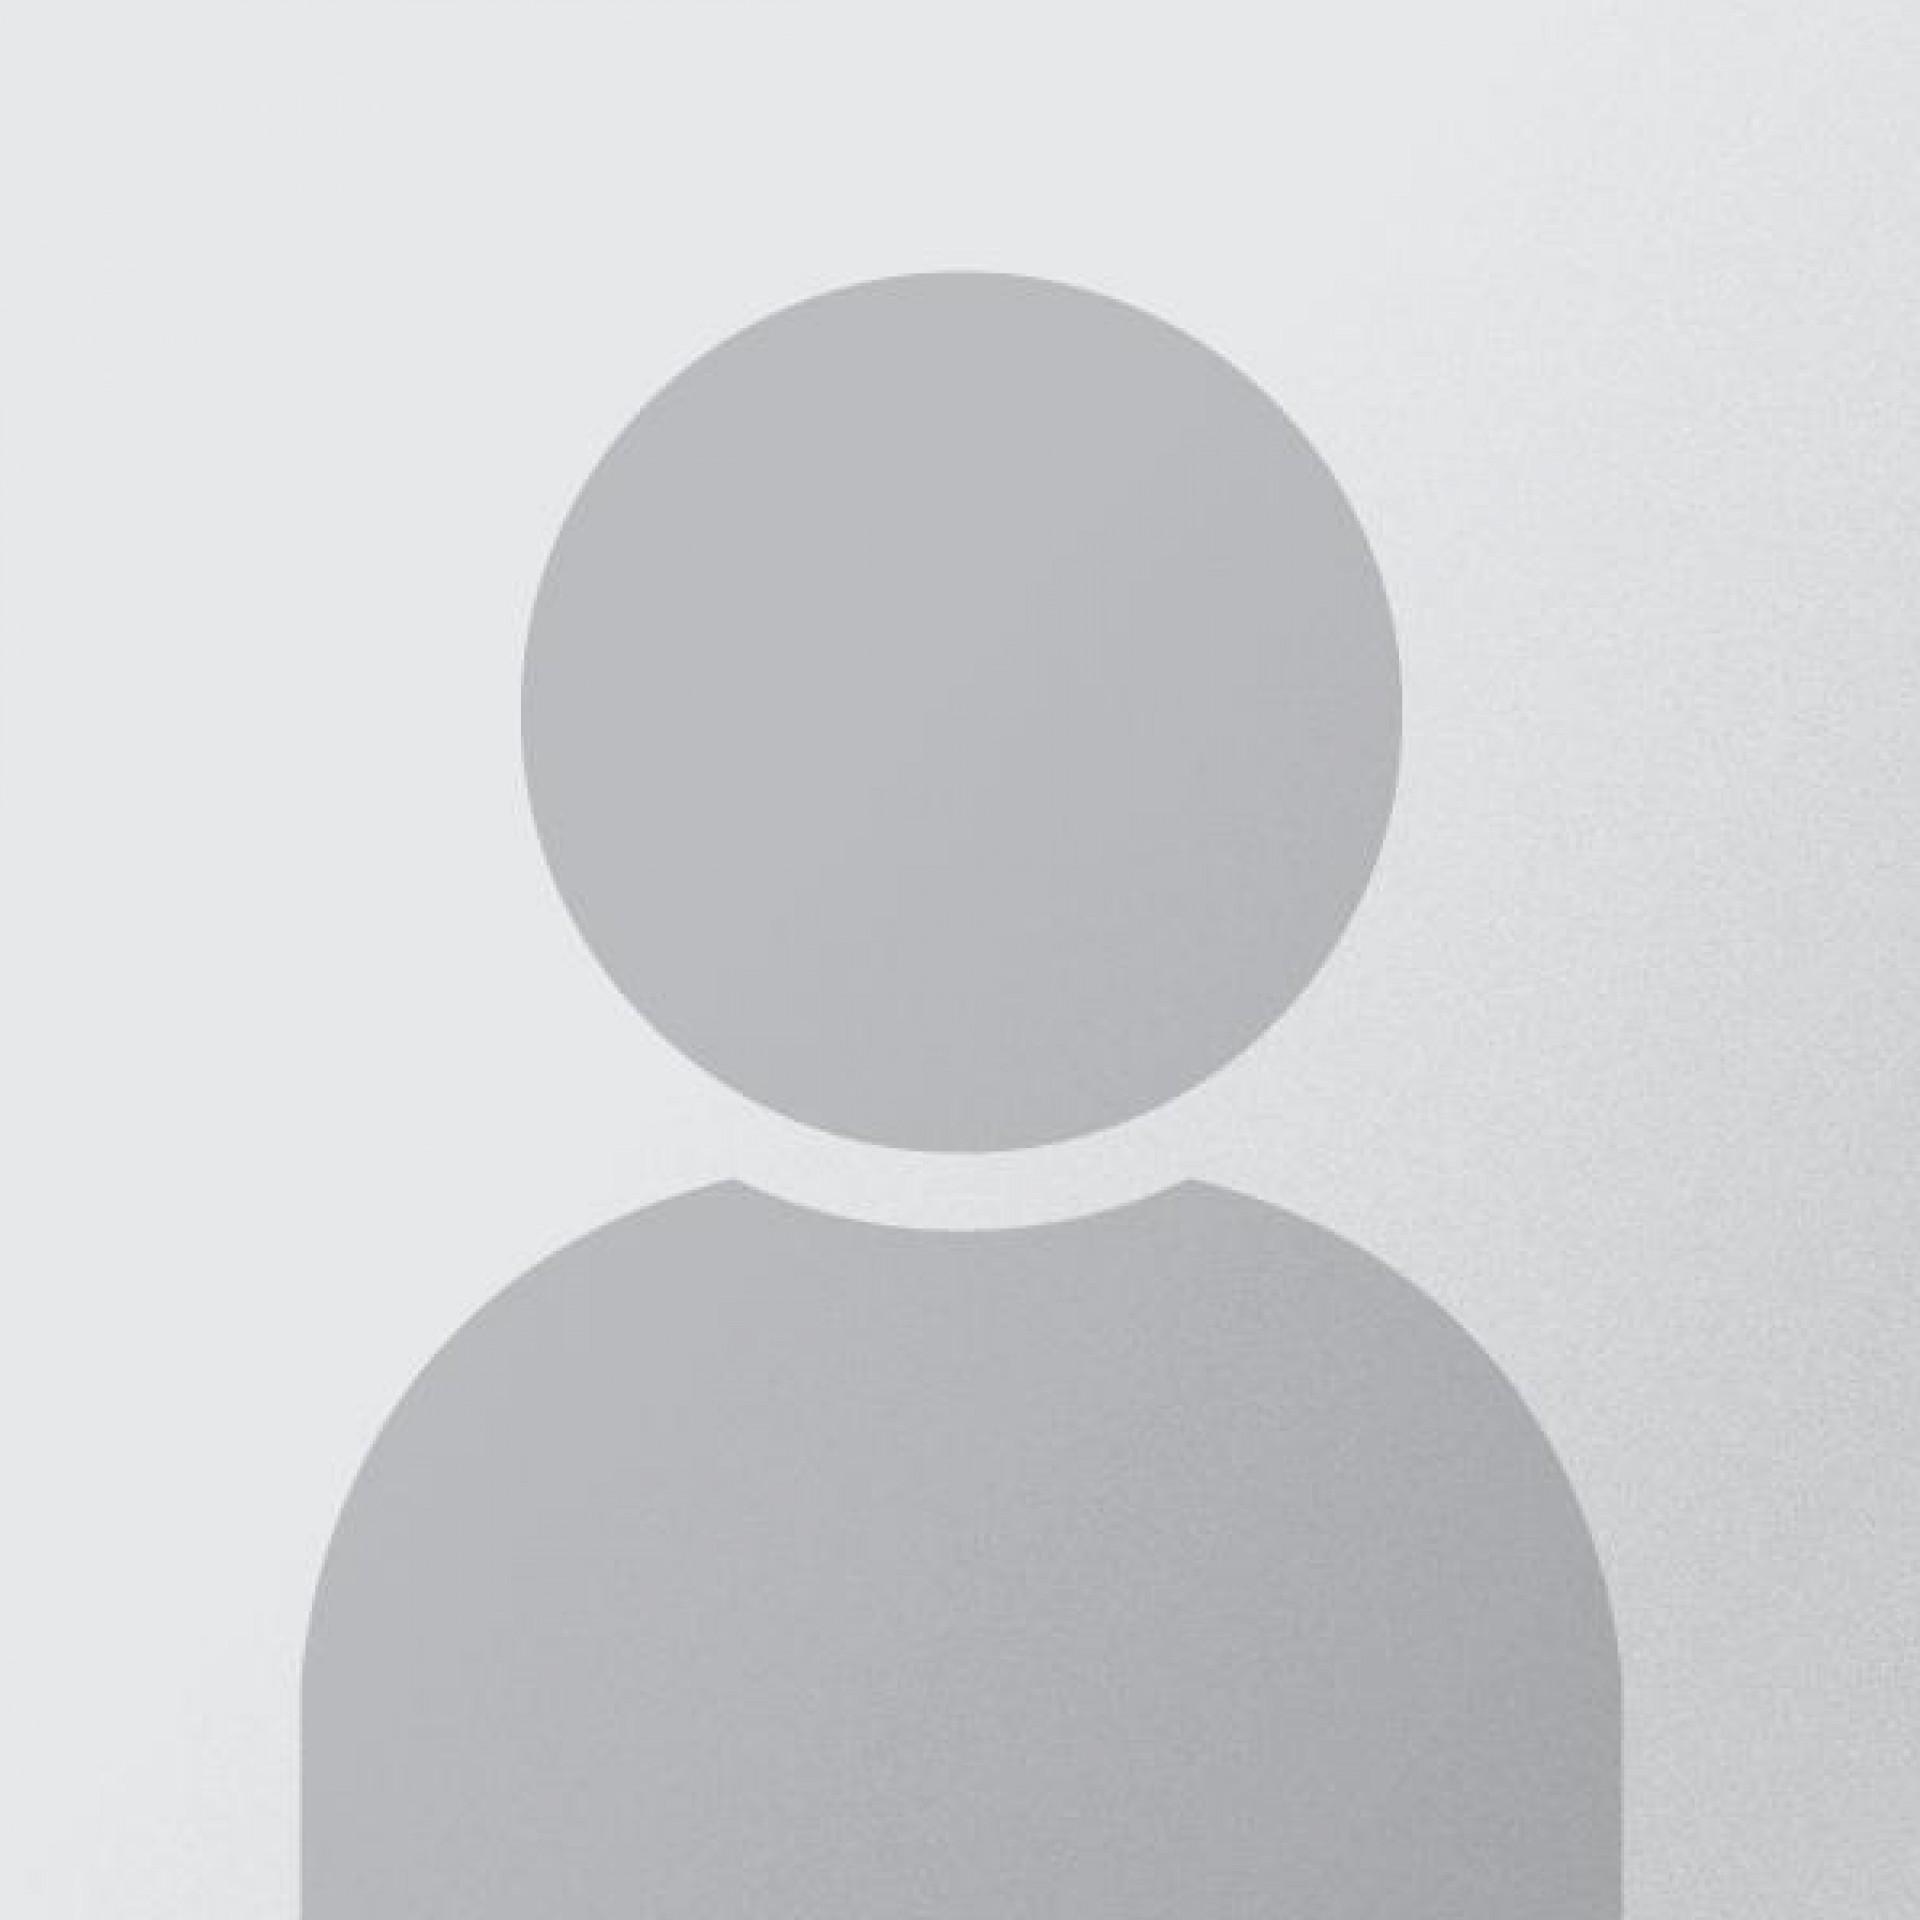 fotografia p021 profilu 01026BS828